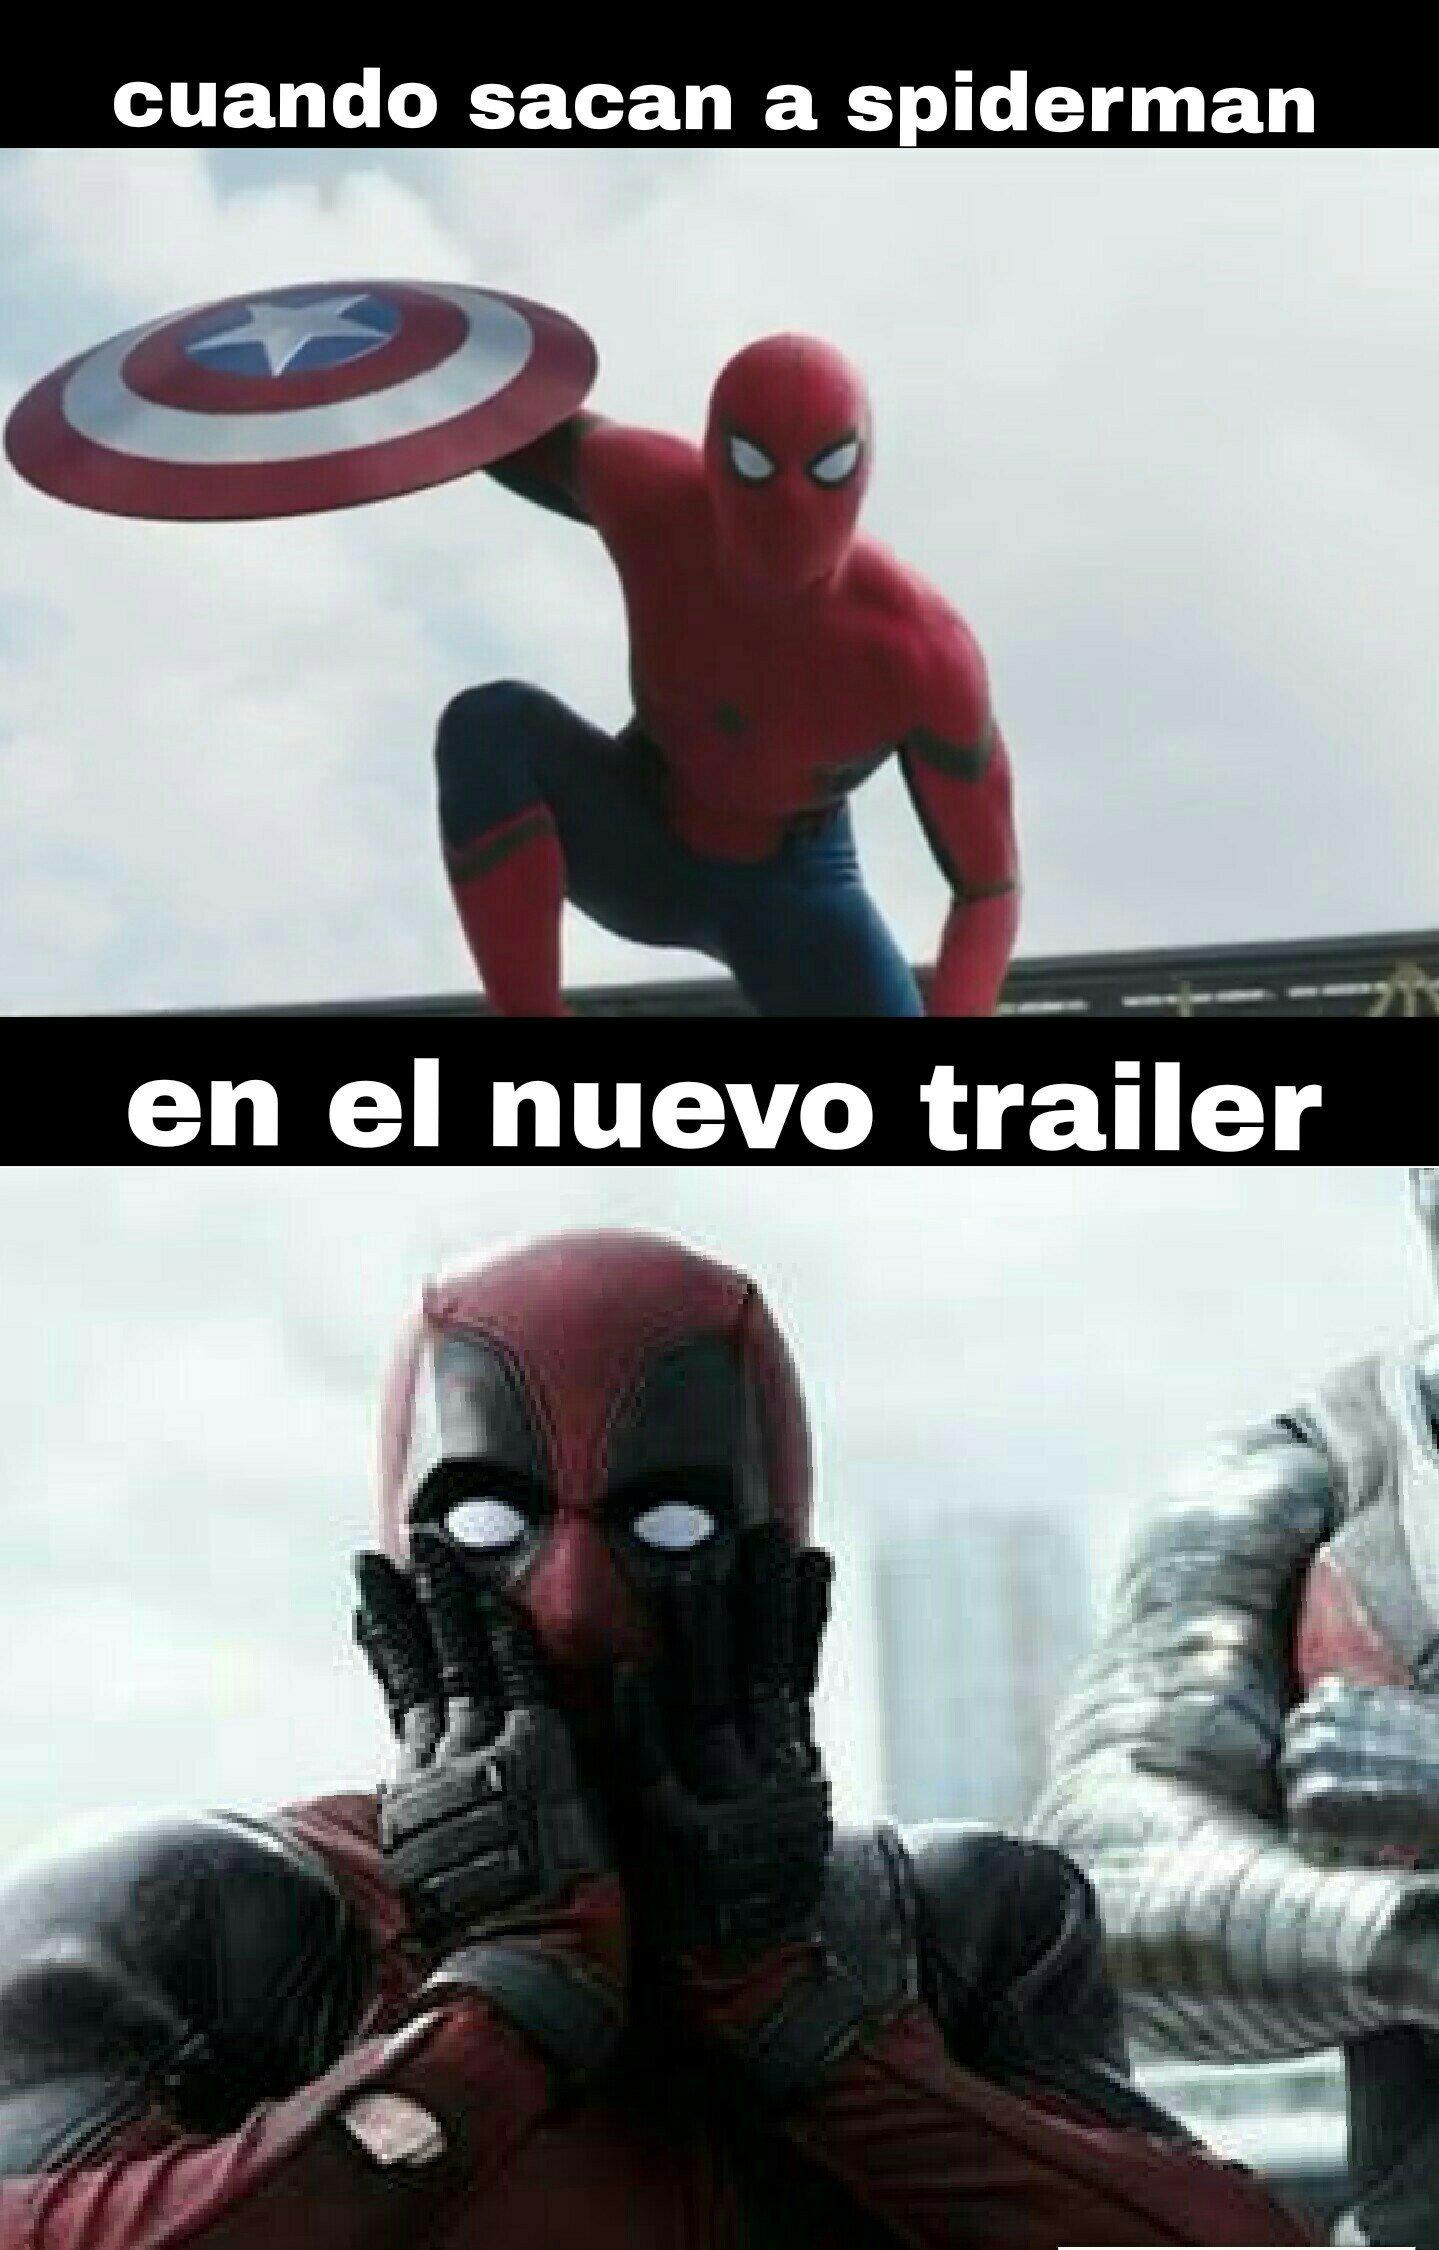 Nuevo trailer - meme